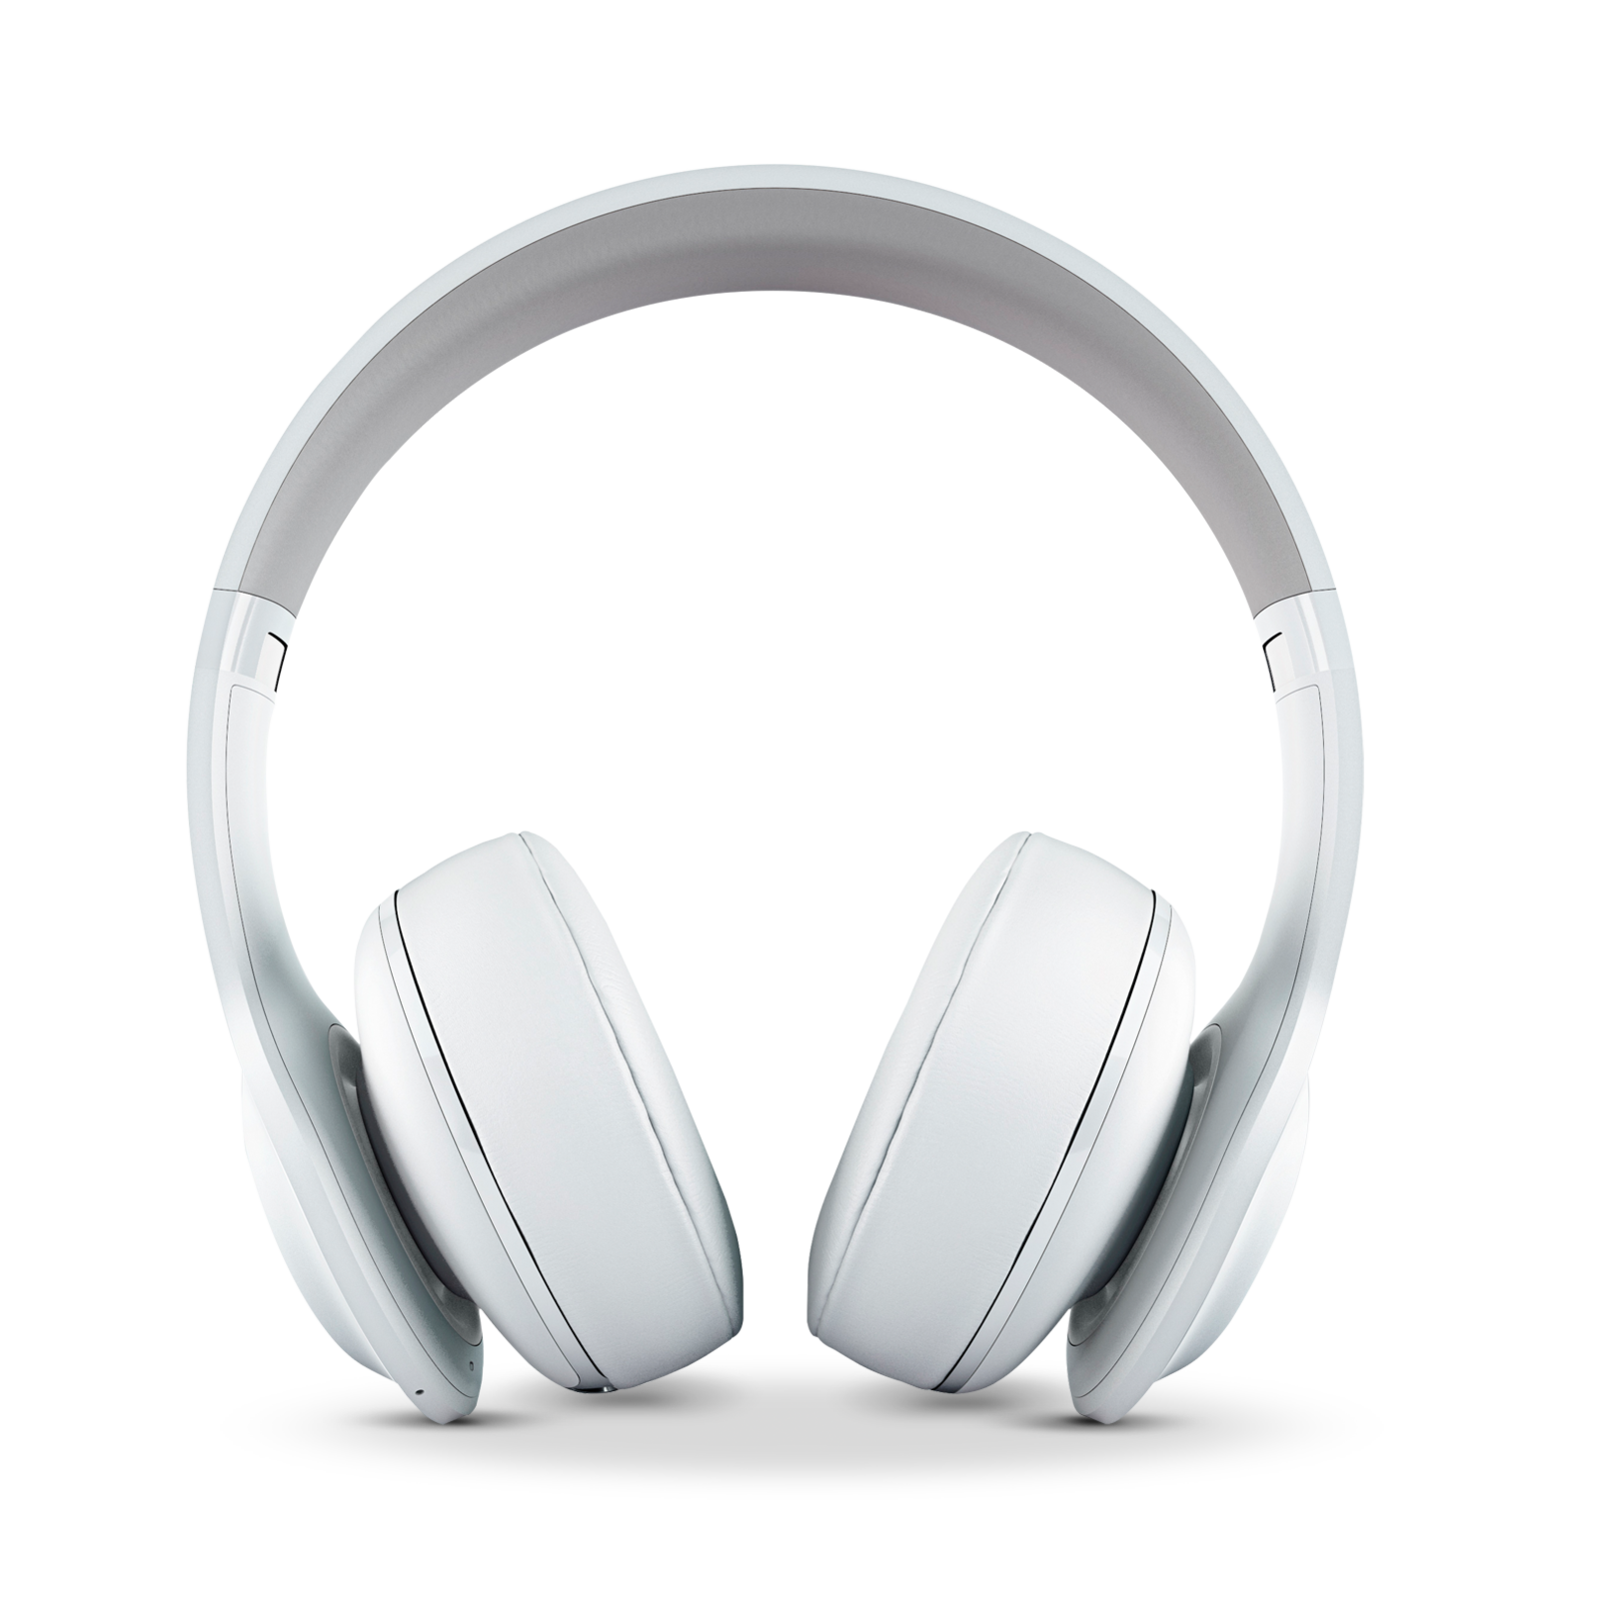 82e2ac20842 JBL® Everest™ 300 | On-ear Wireless Headphones